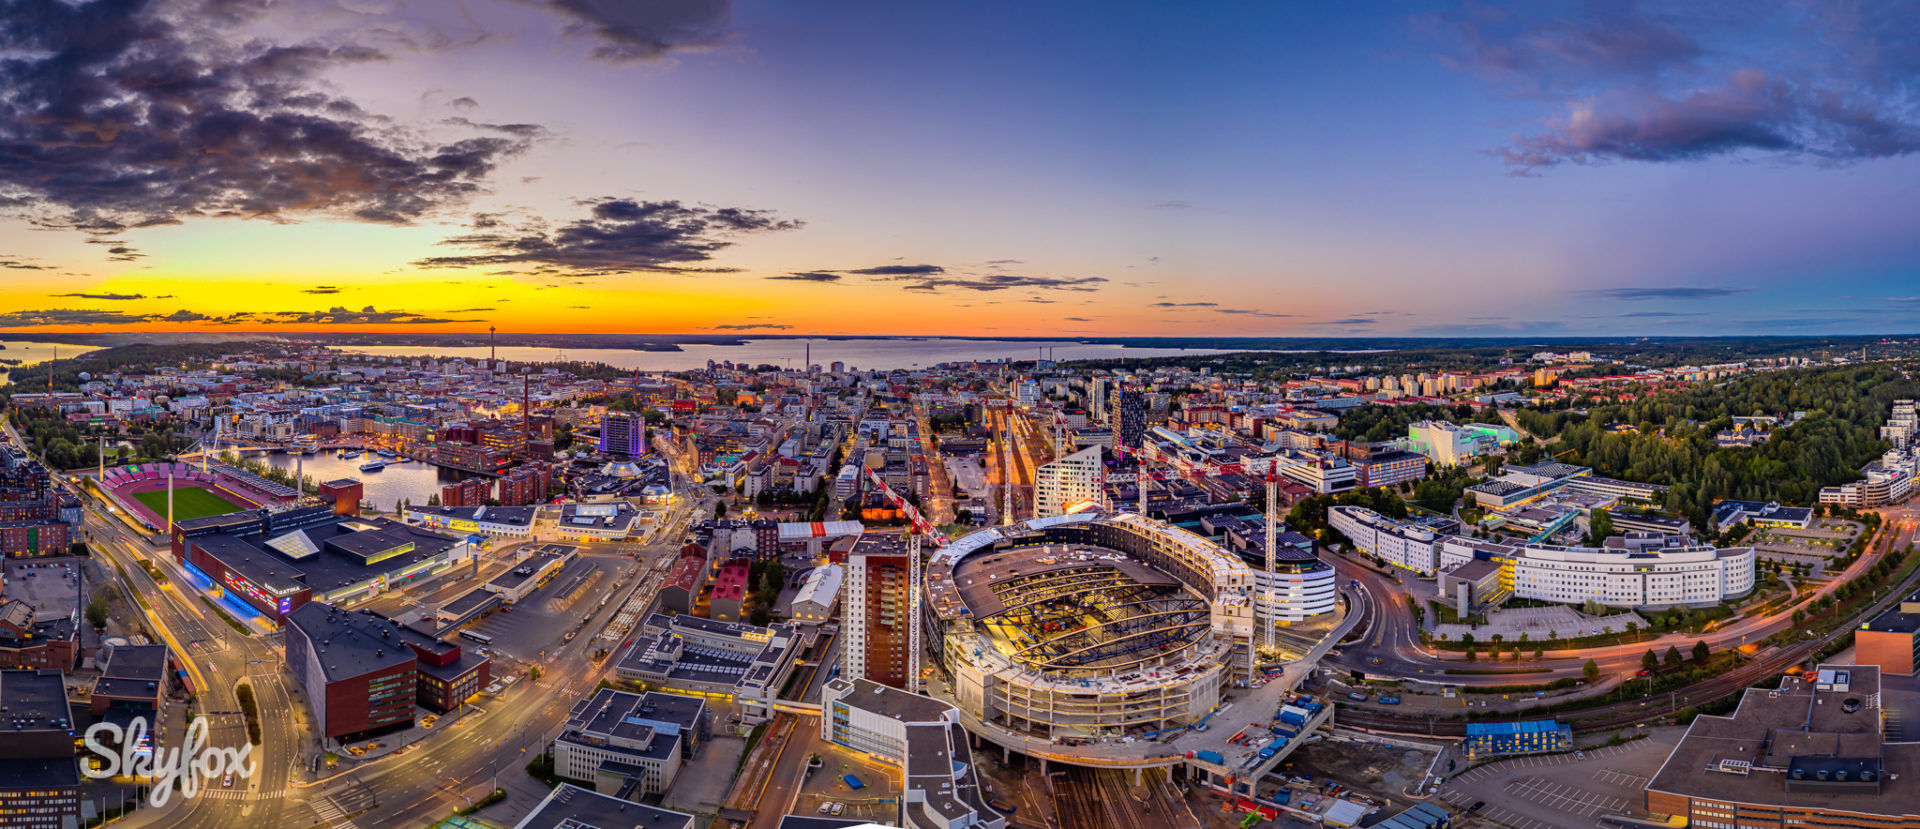 Tampere panorama skyview. Photo: Marko Kallio